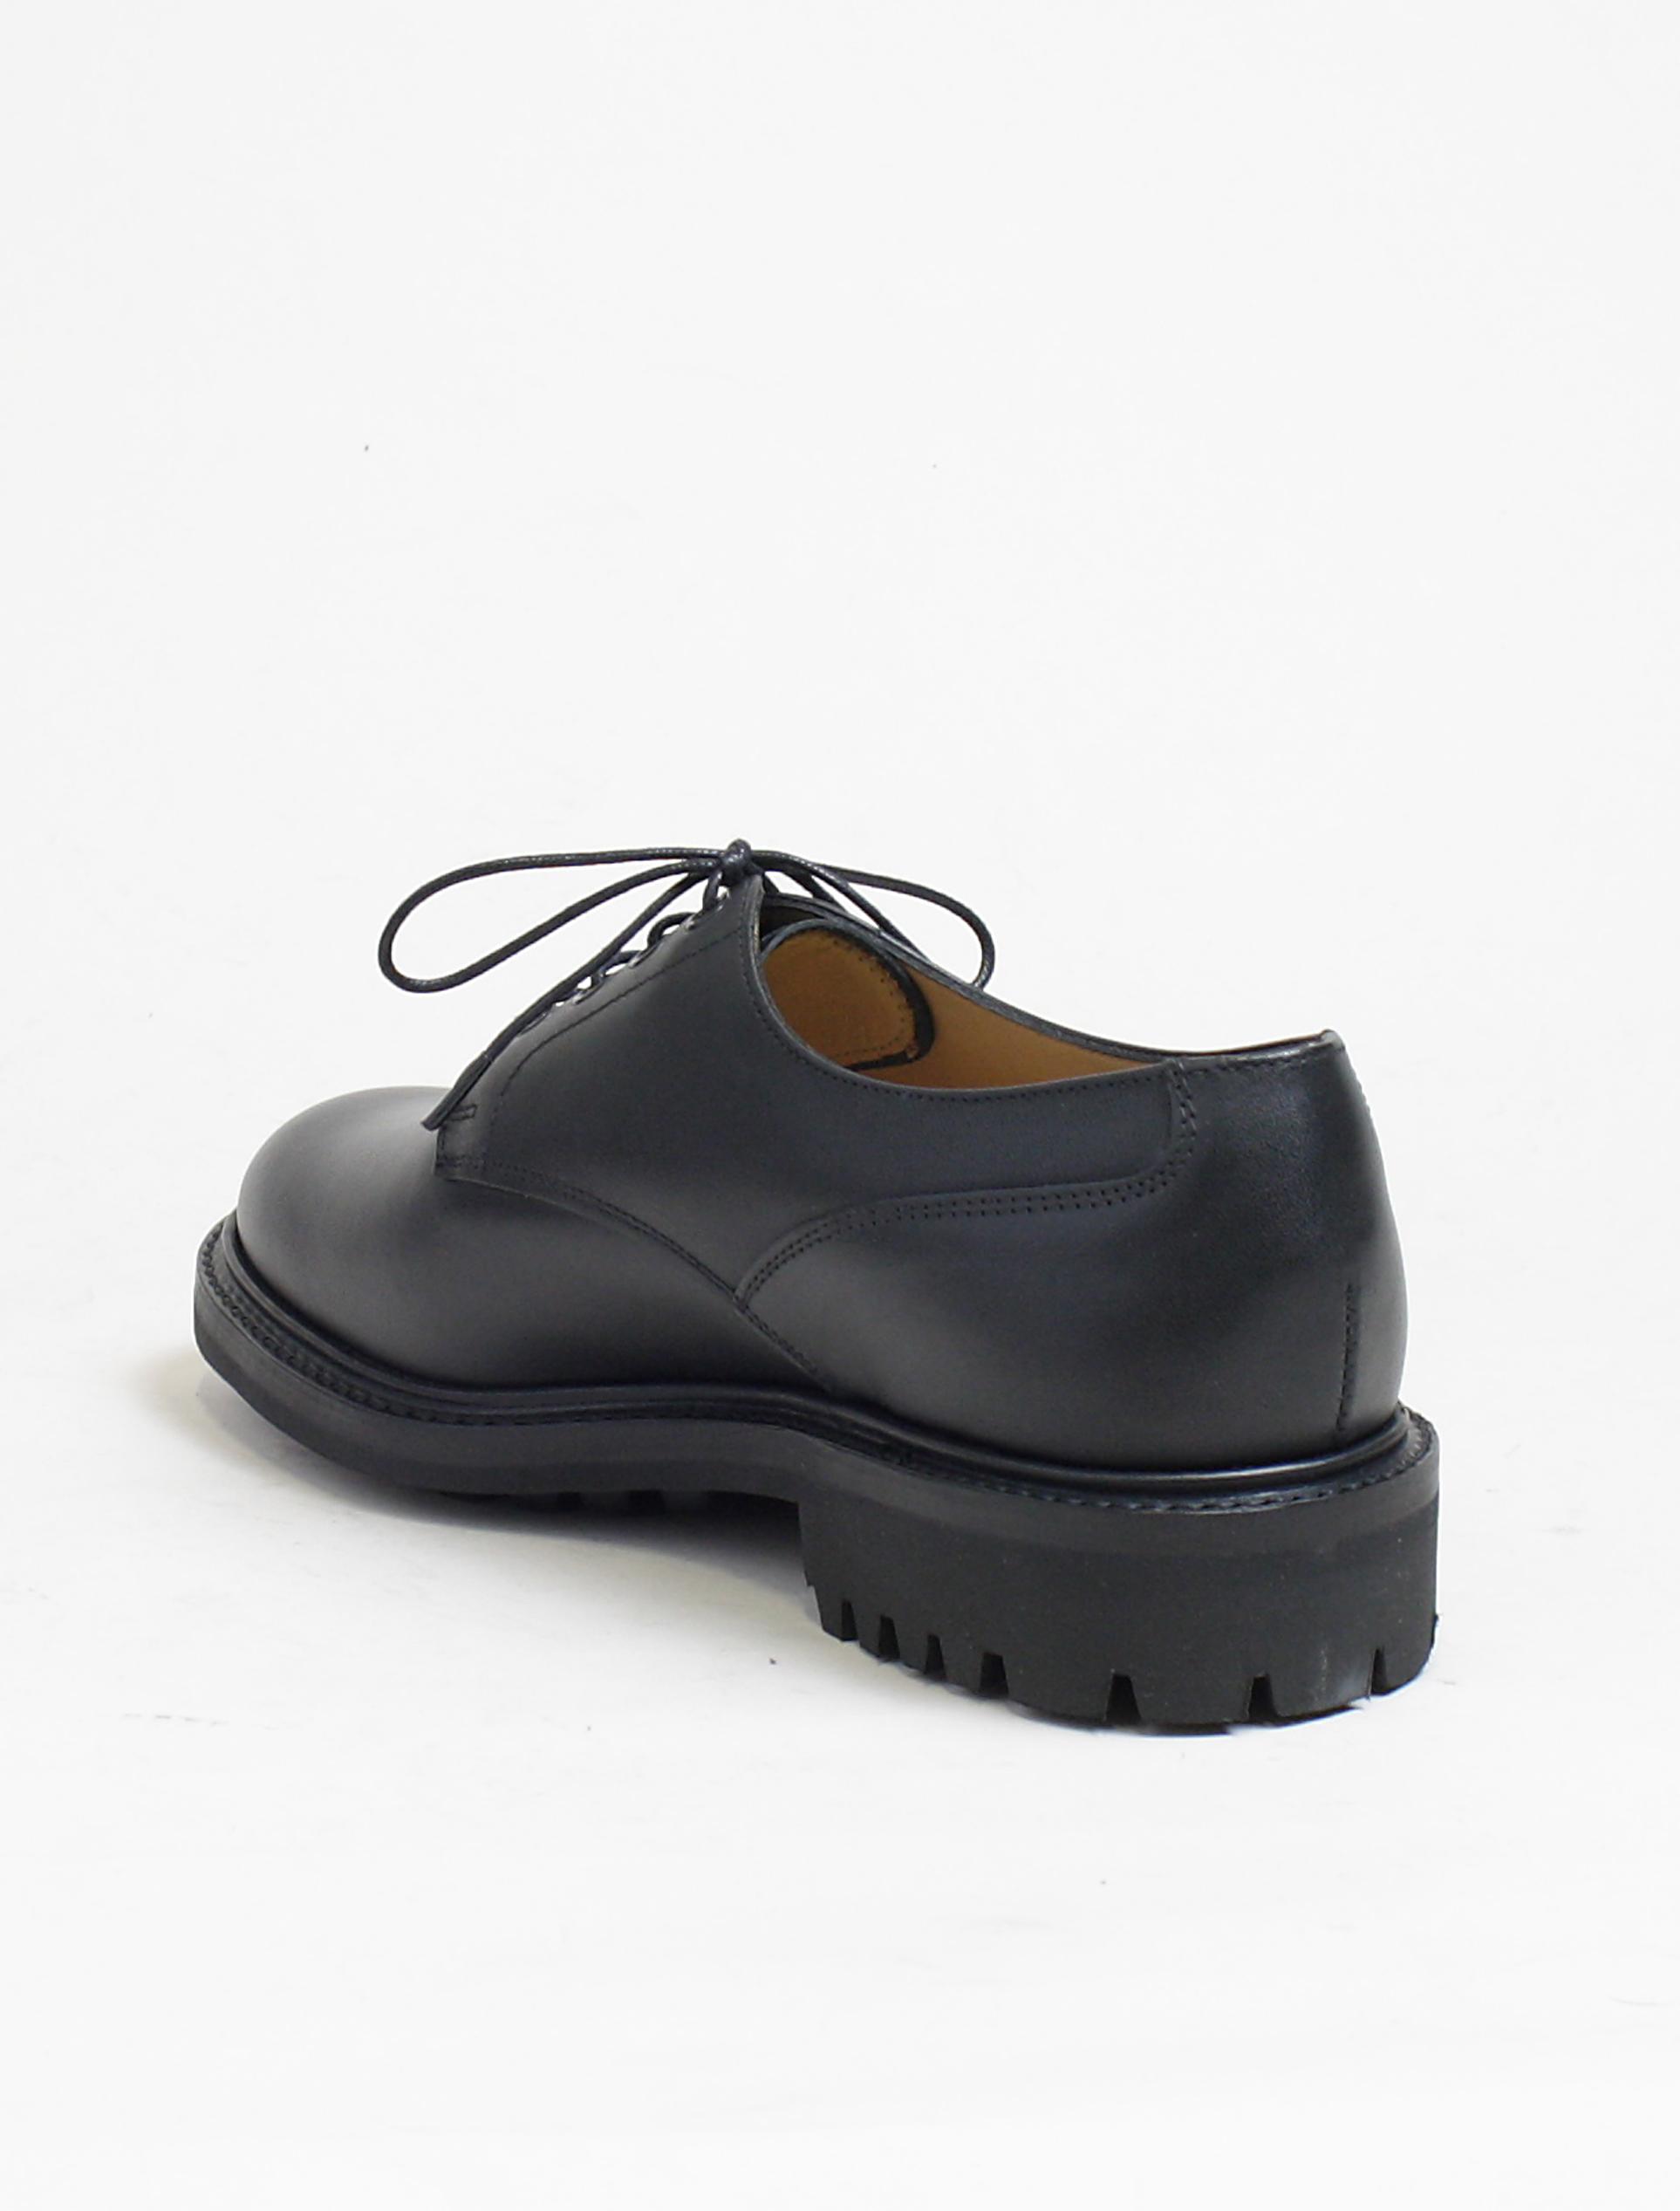 Sanders 9920 derby shoes black calf commando back detail